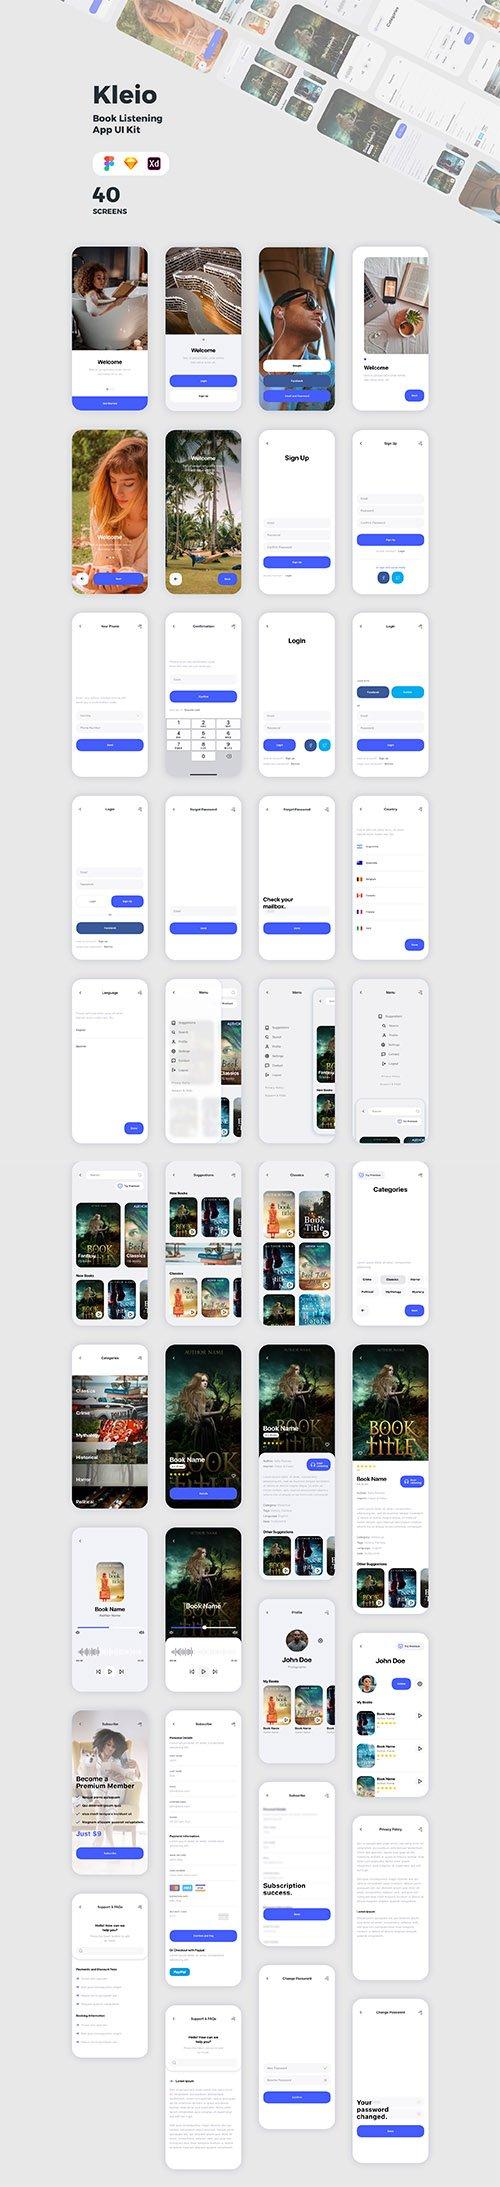 Kleio Book Listening App UI Kit